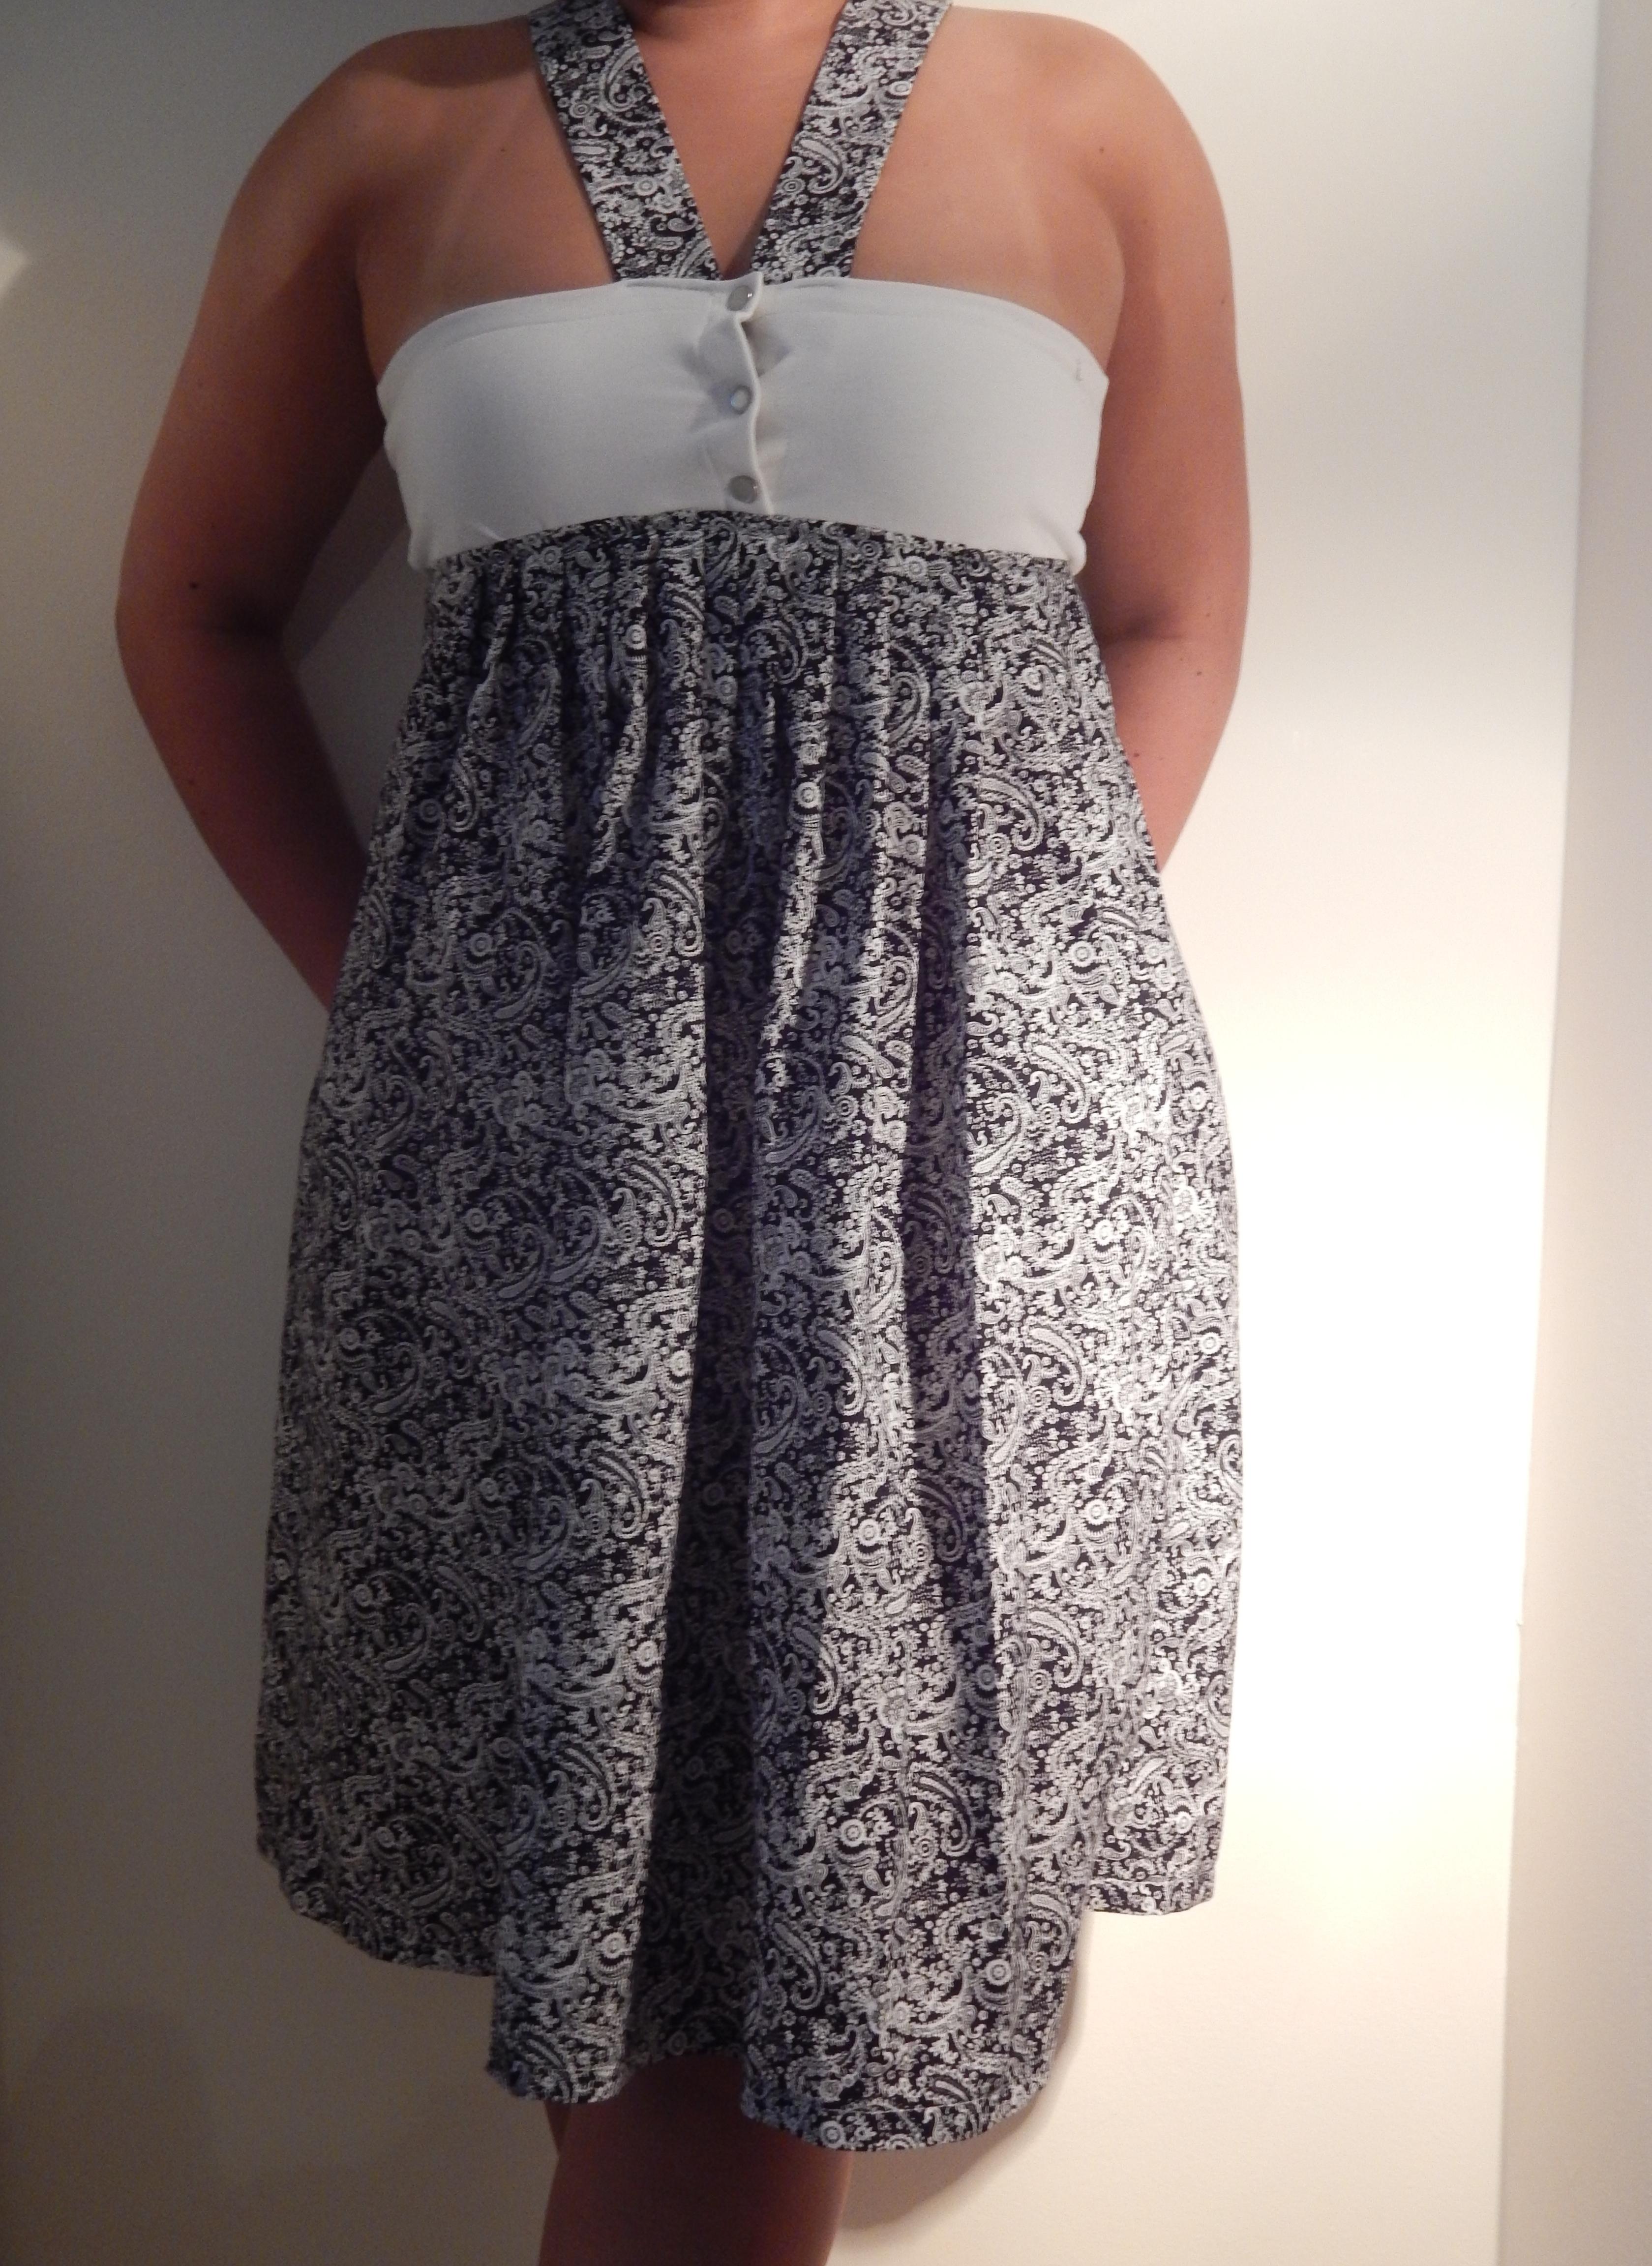 couture  u2013 transformer une robe toute simple  u2026  u2013 lagouagouache